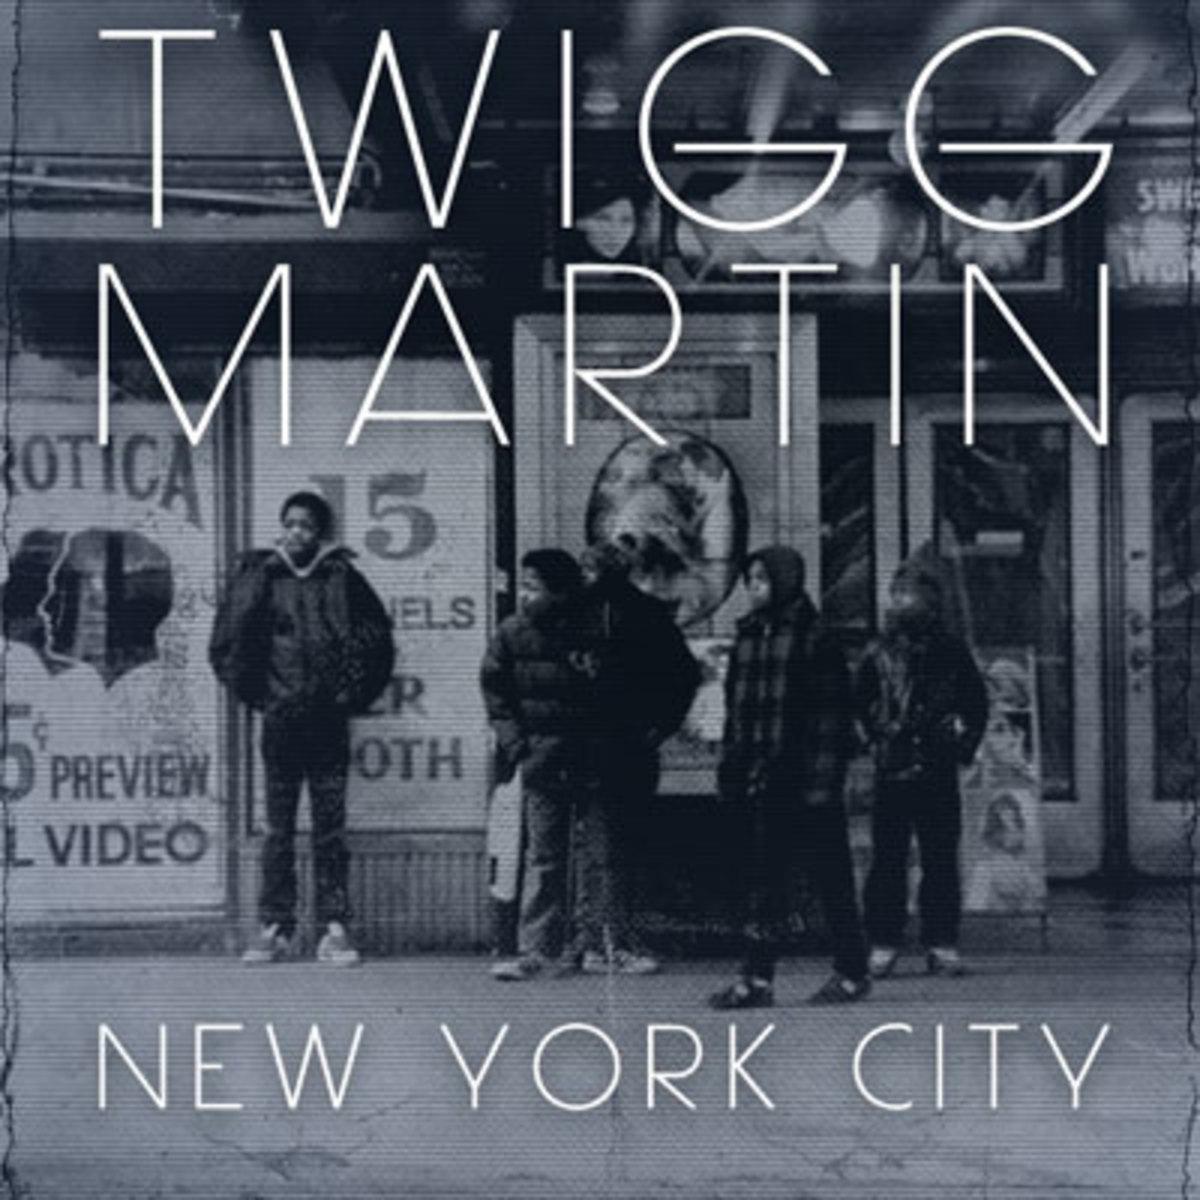 twiggmartin-newyorkcity.jpg